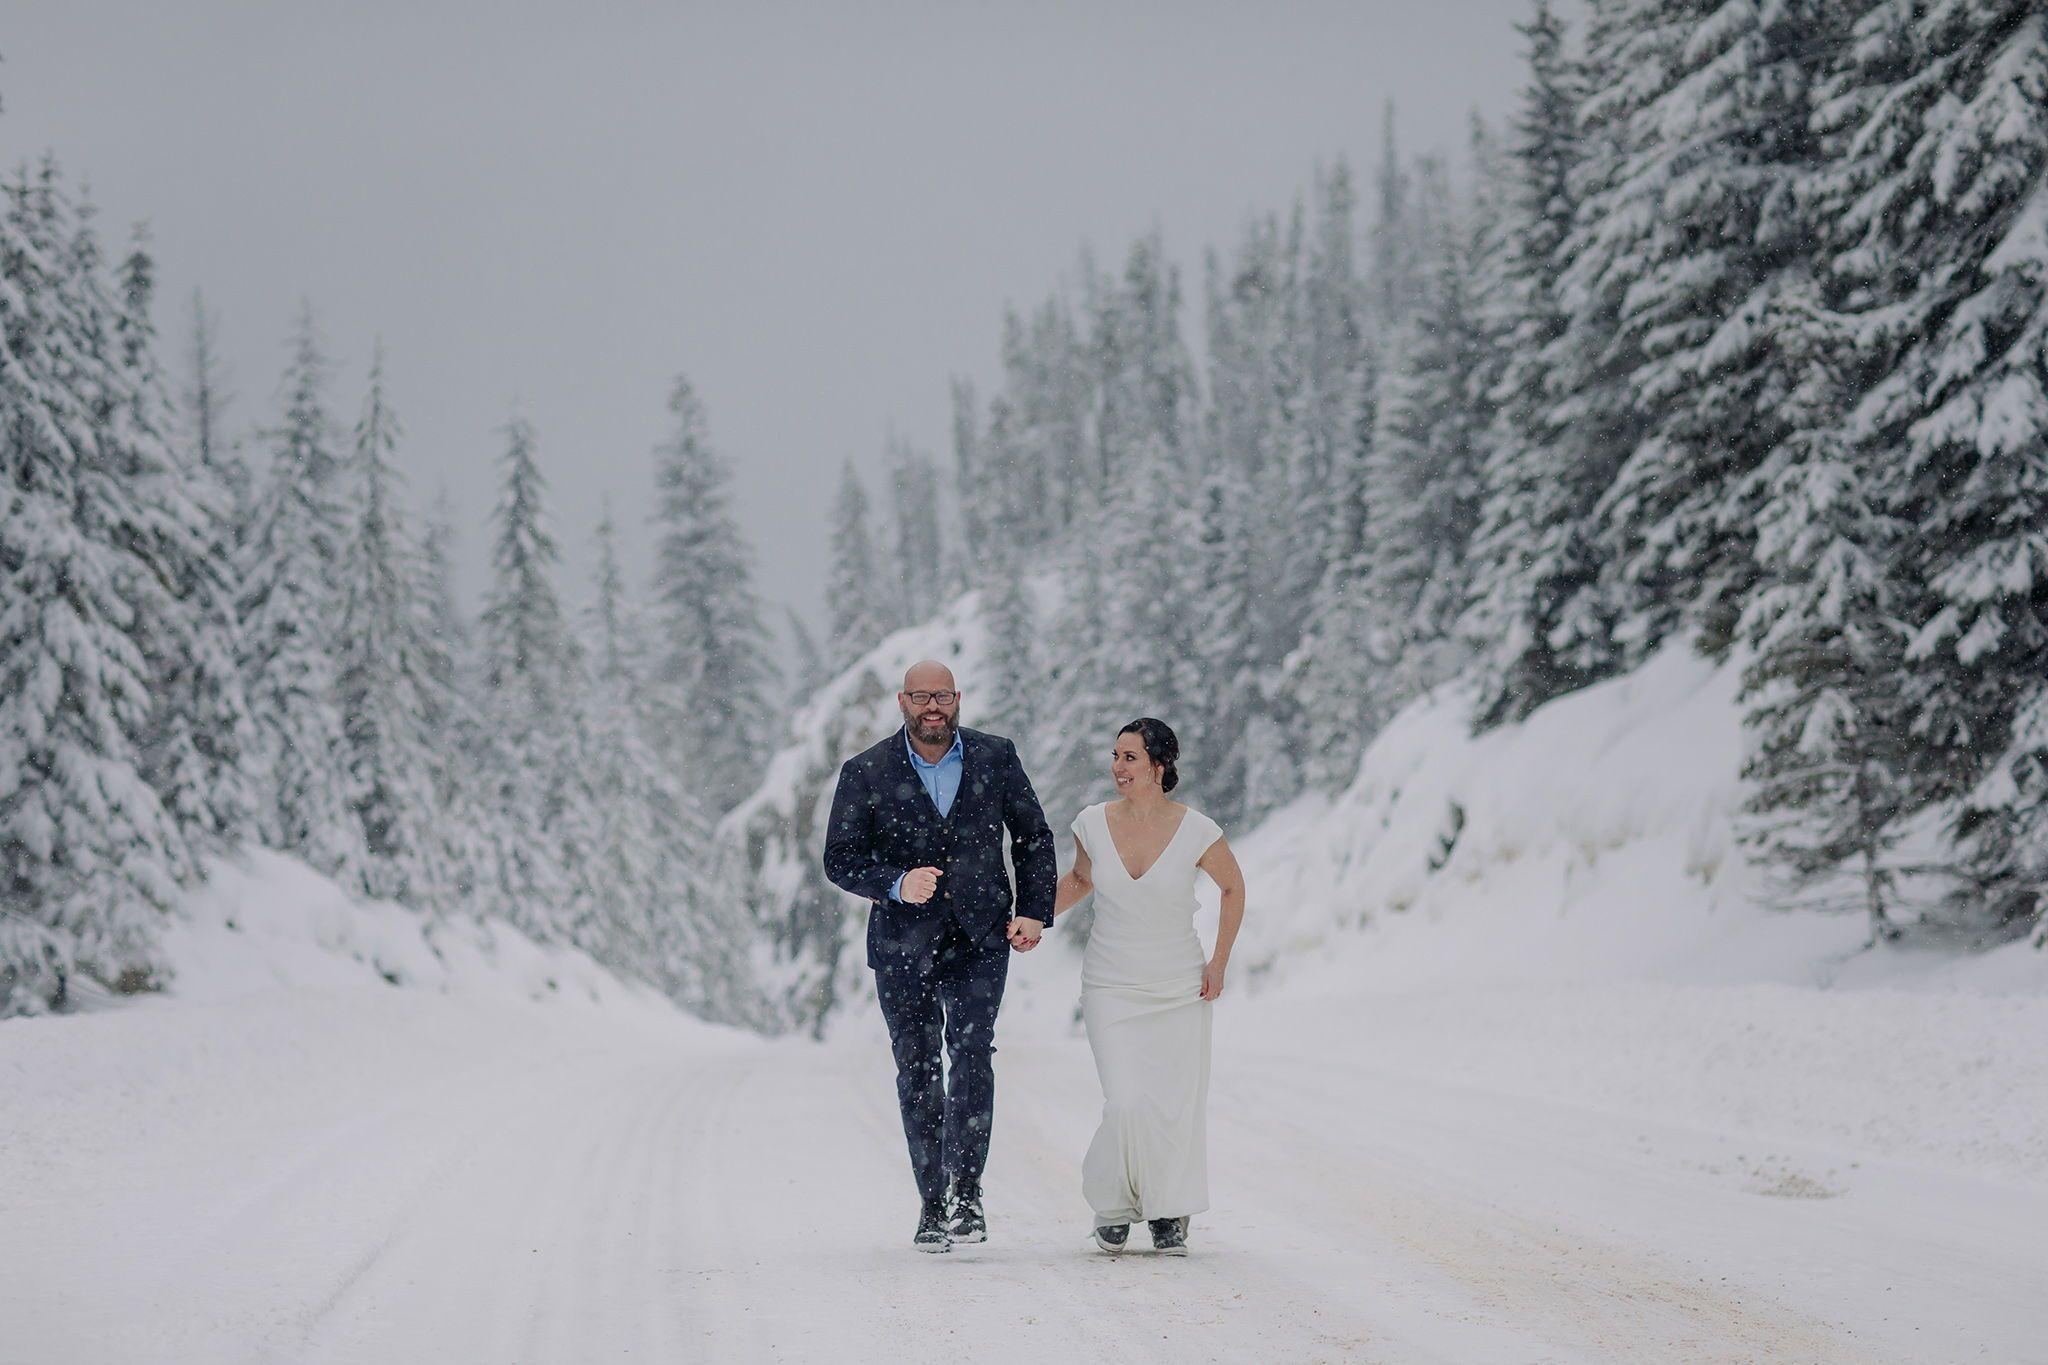 Pin on Emerald Lake Weddings, Elopements & Engagements